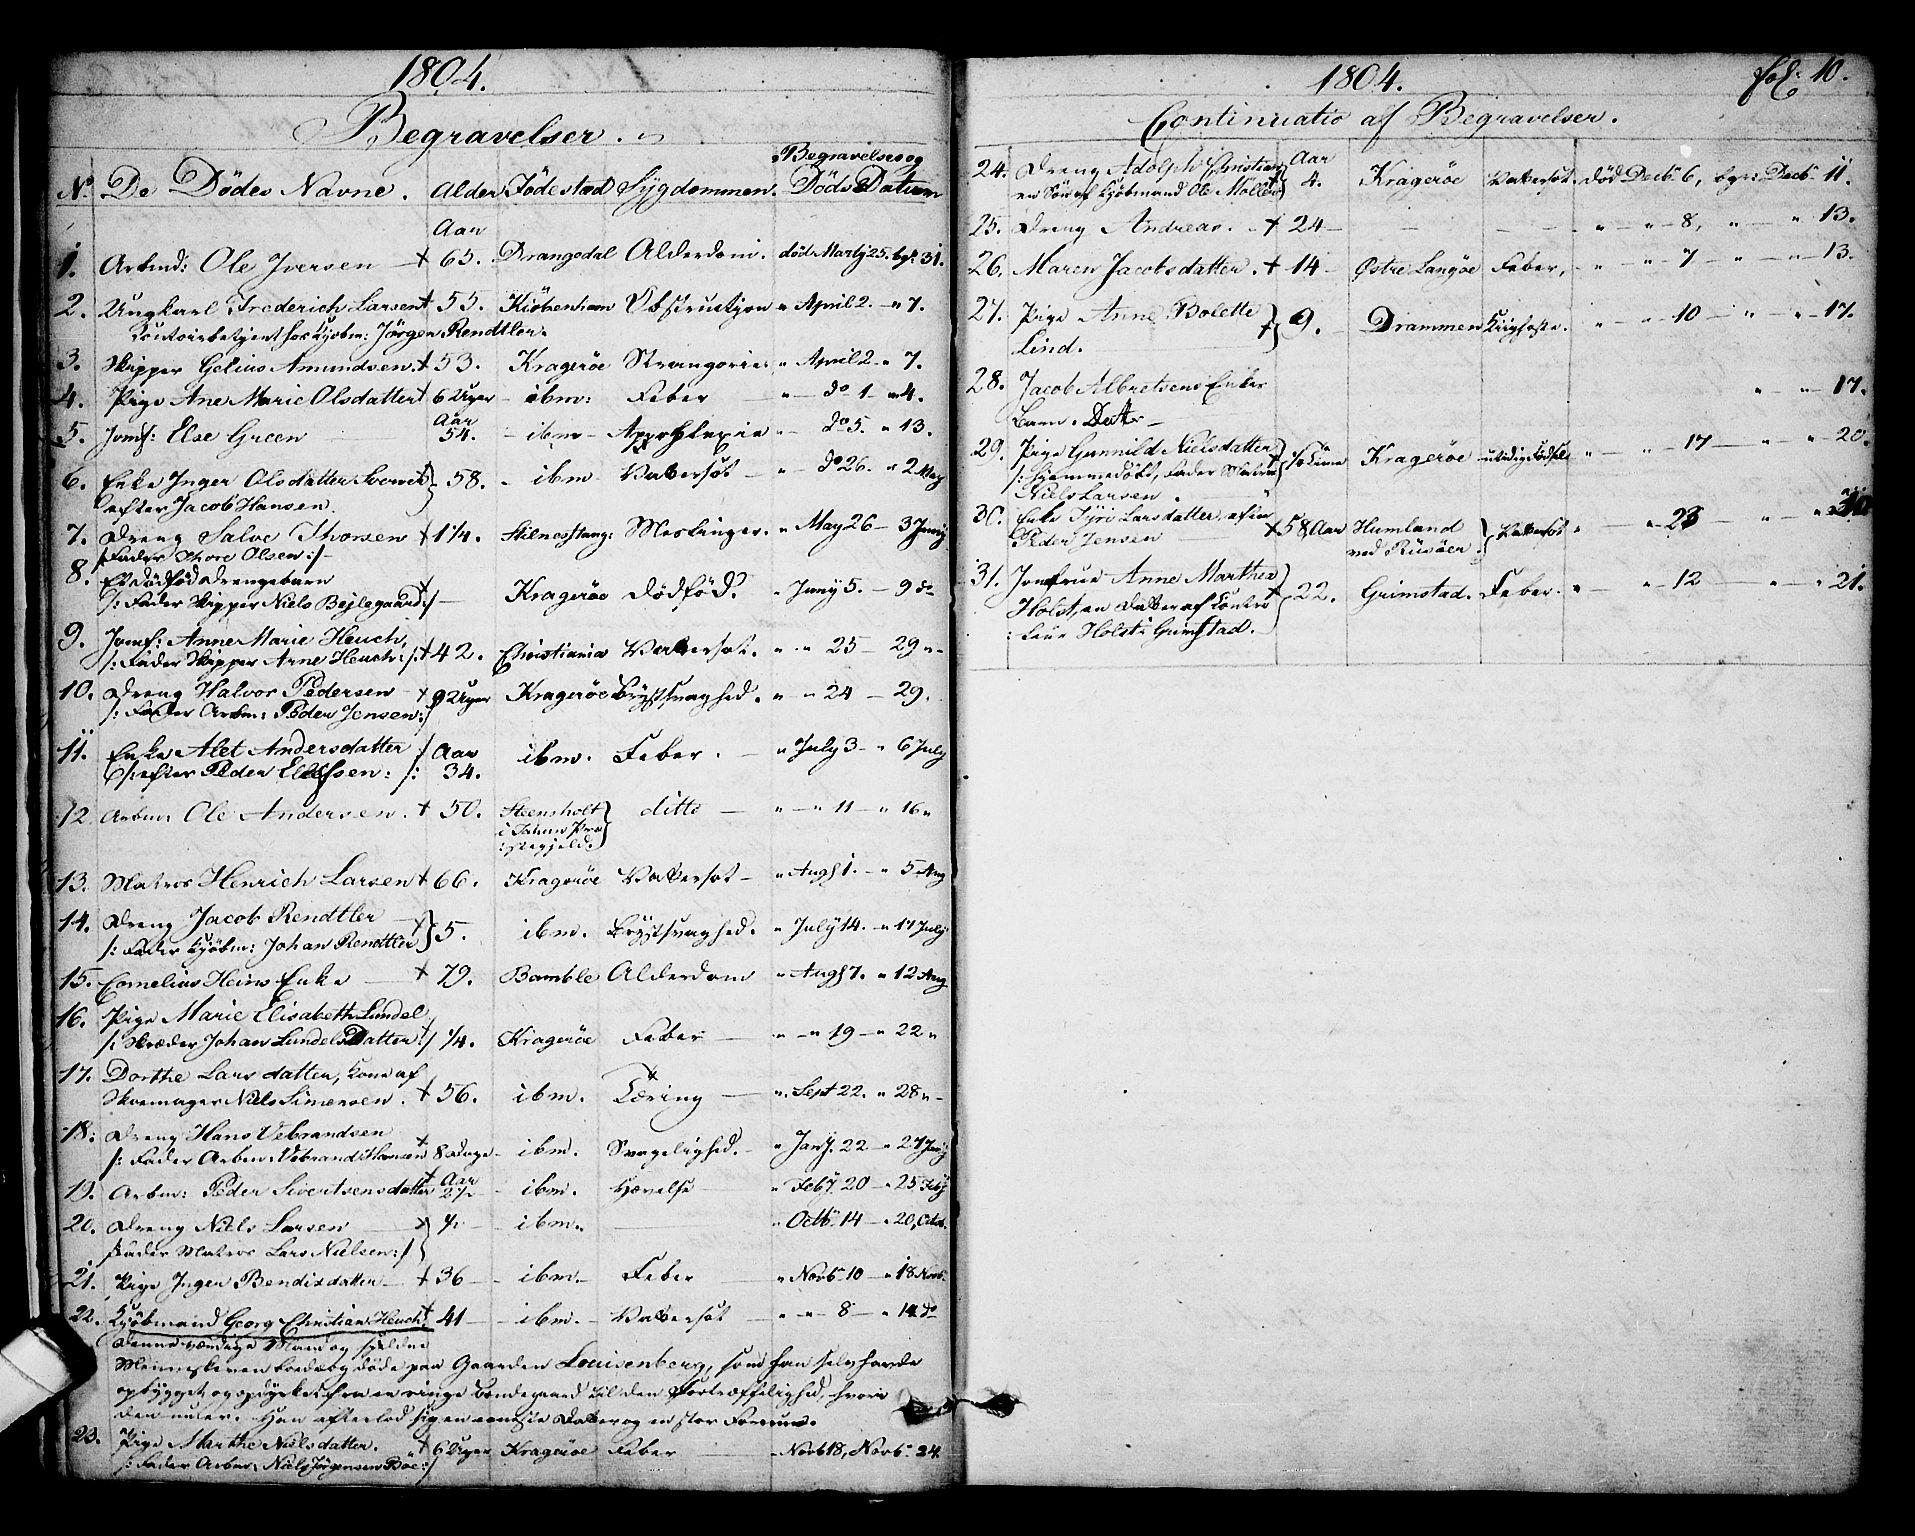 SAKO, Kragerø kirkebøker, F/Fa/L0003: Ministerialbok nr. 3, 1802-1813, s. 10